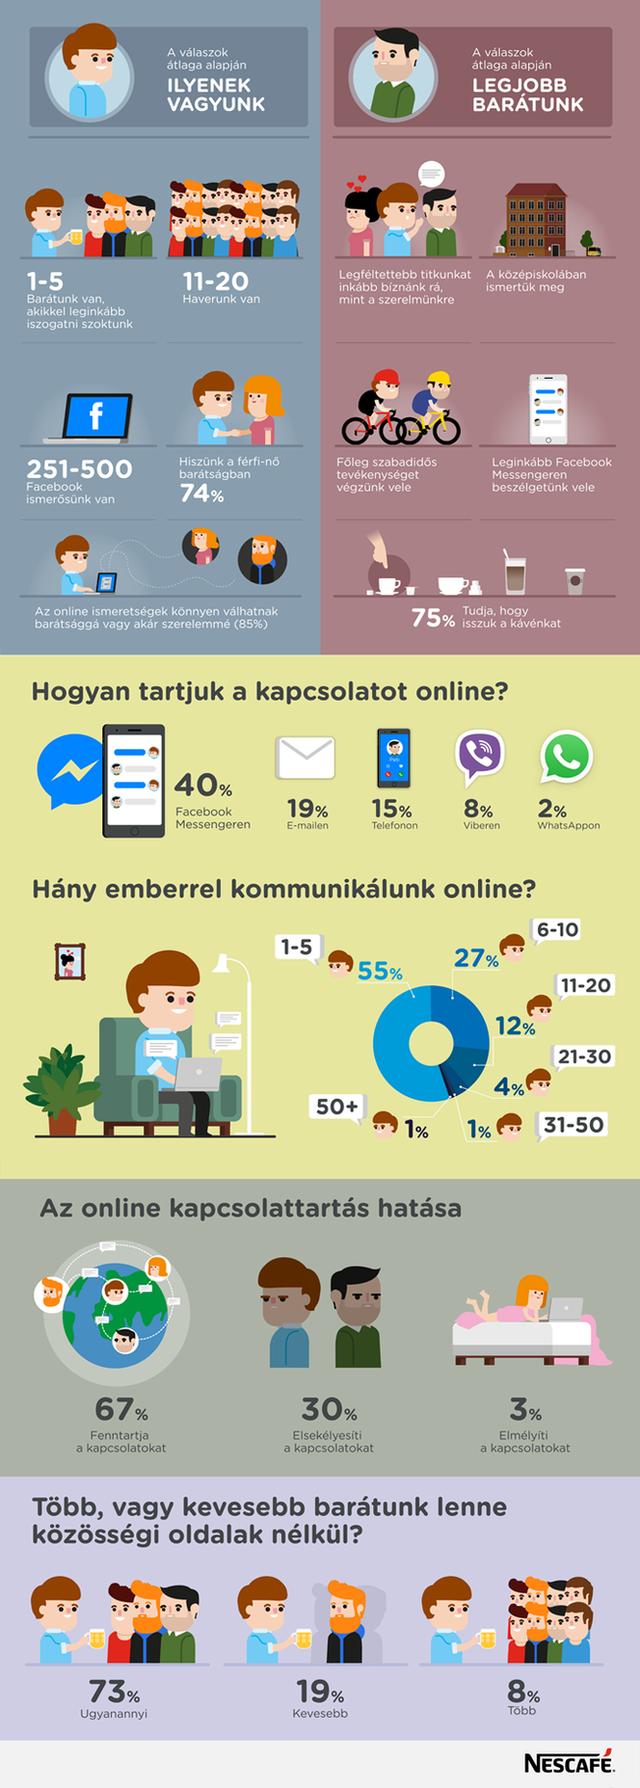 NESCAFE Baratsag infografika 20160524.png